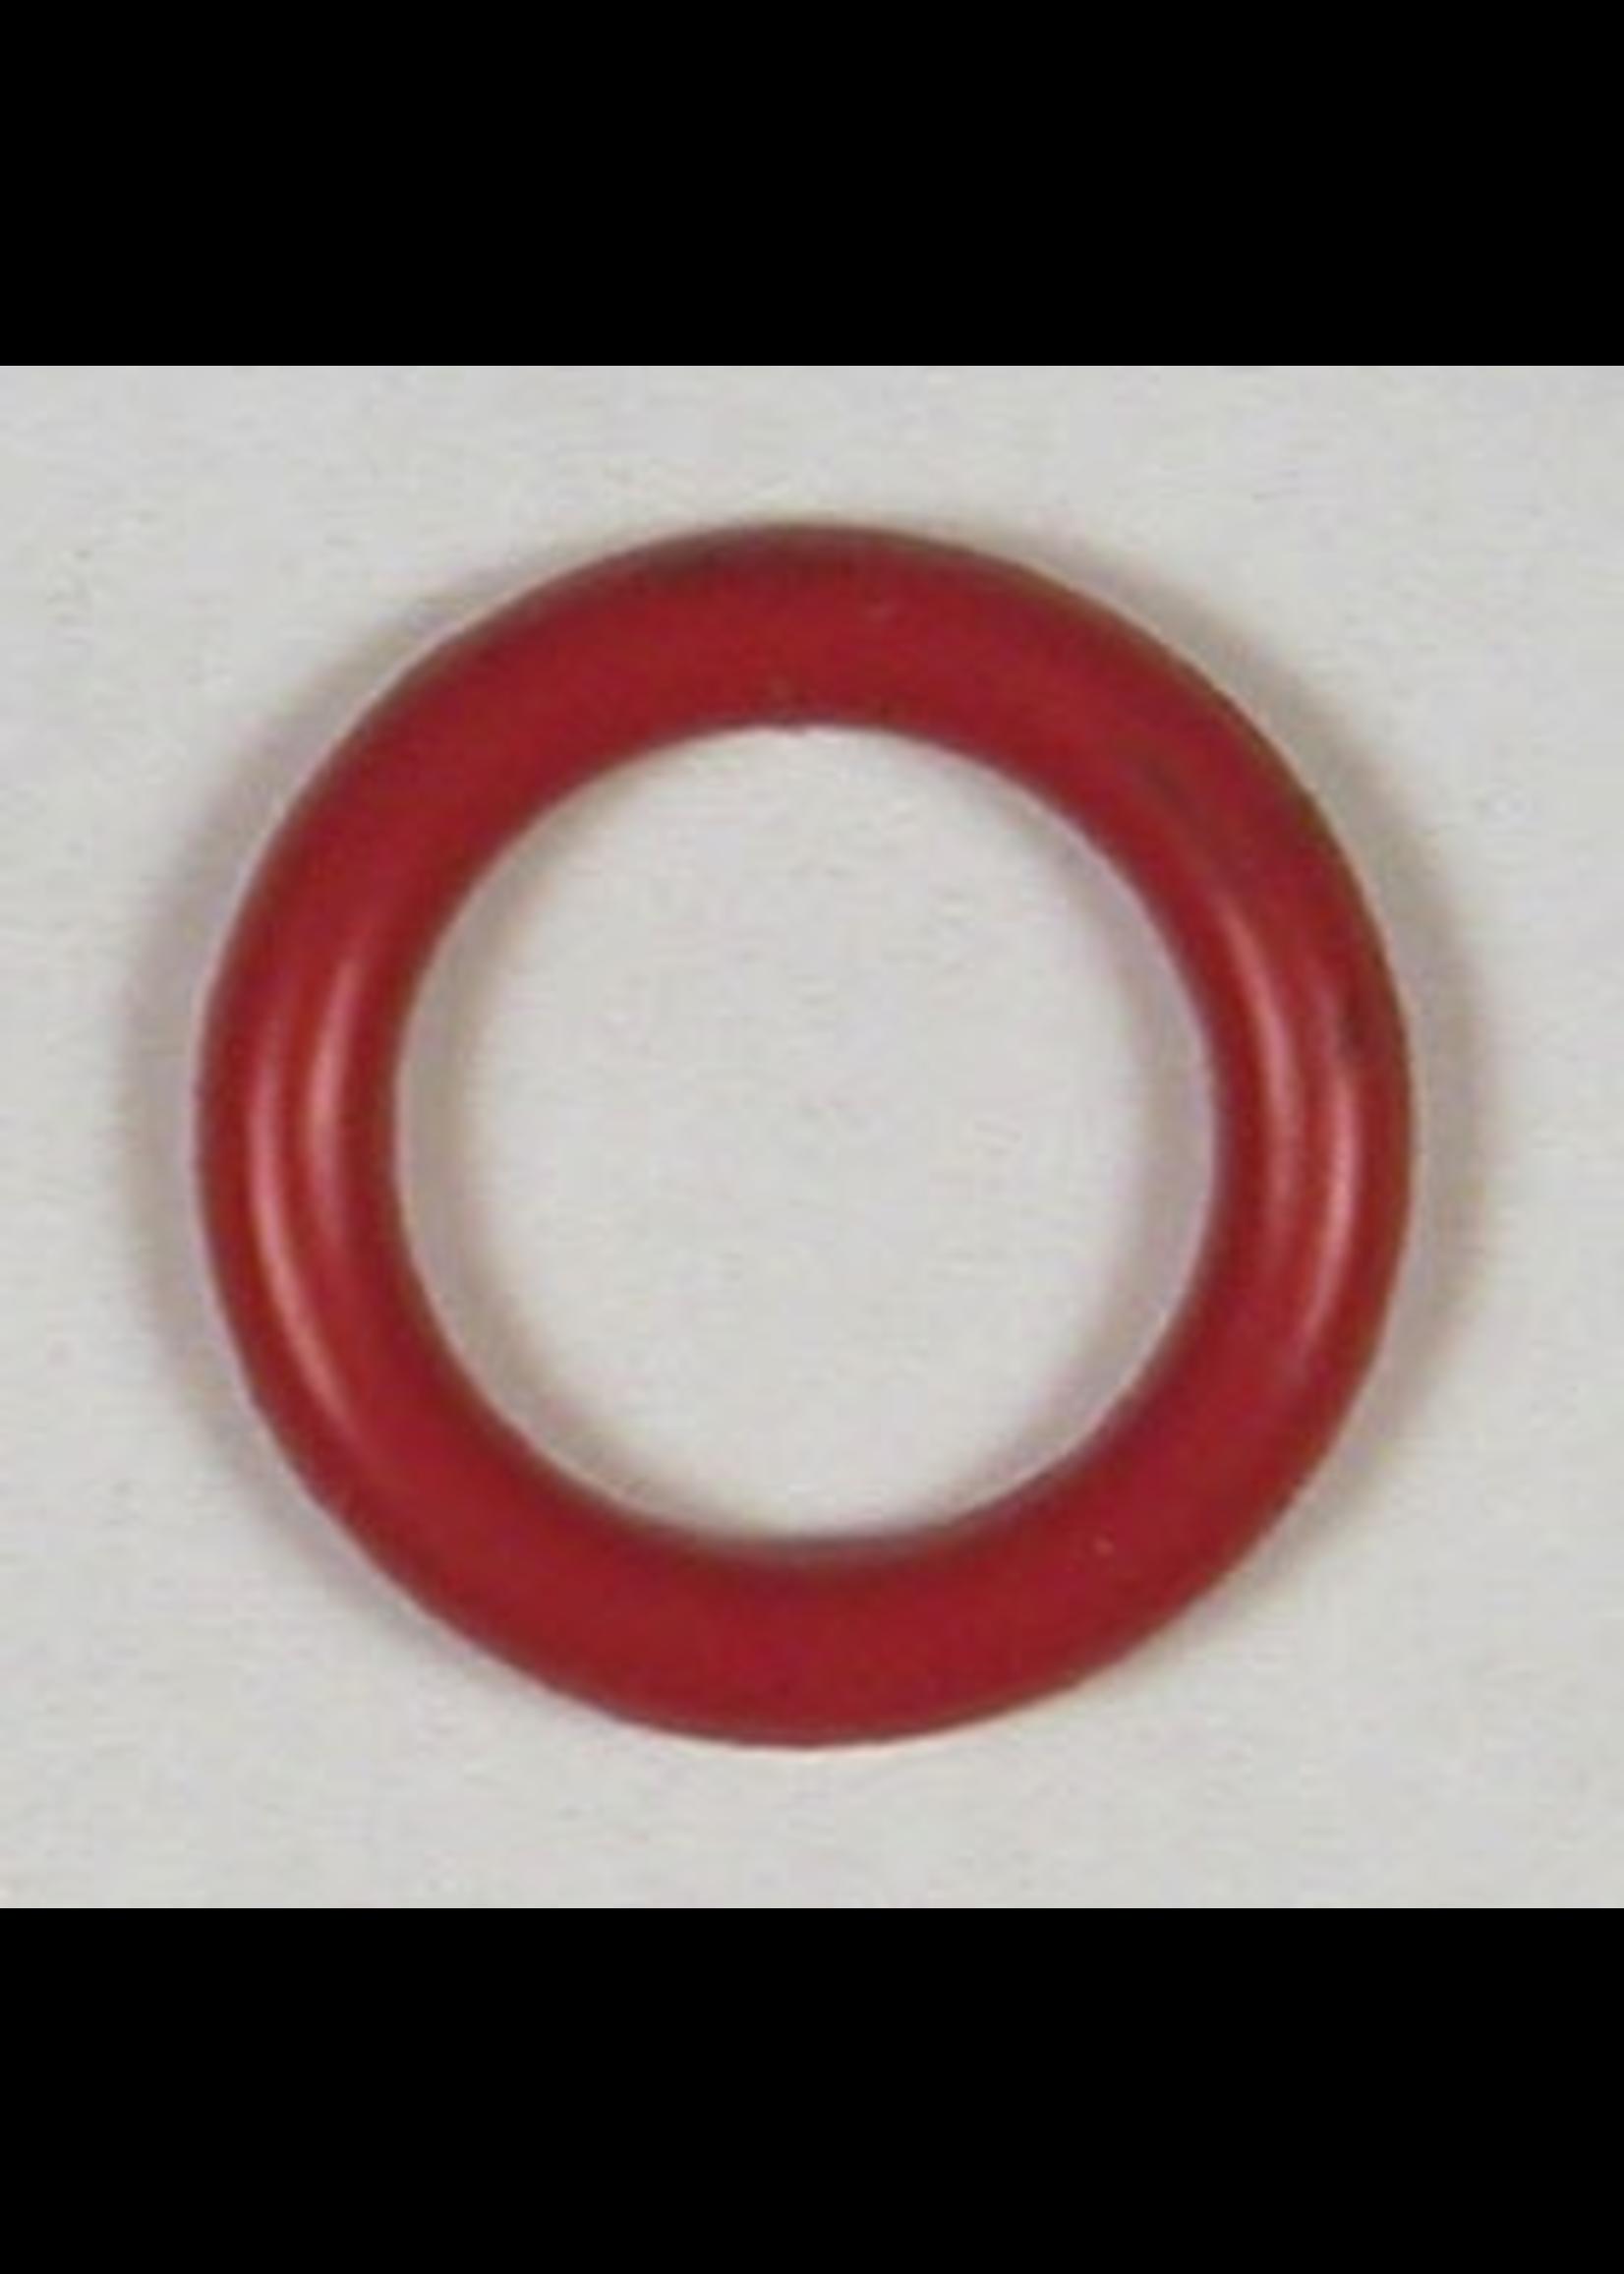 Blichmann Blichmann BrewMometer - Replacement O-Ring